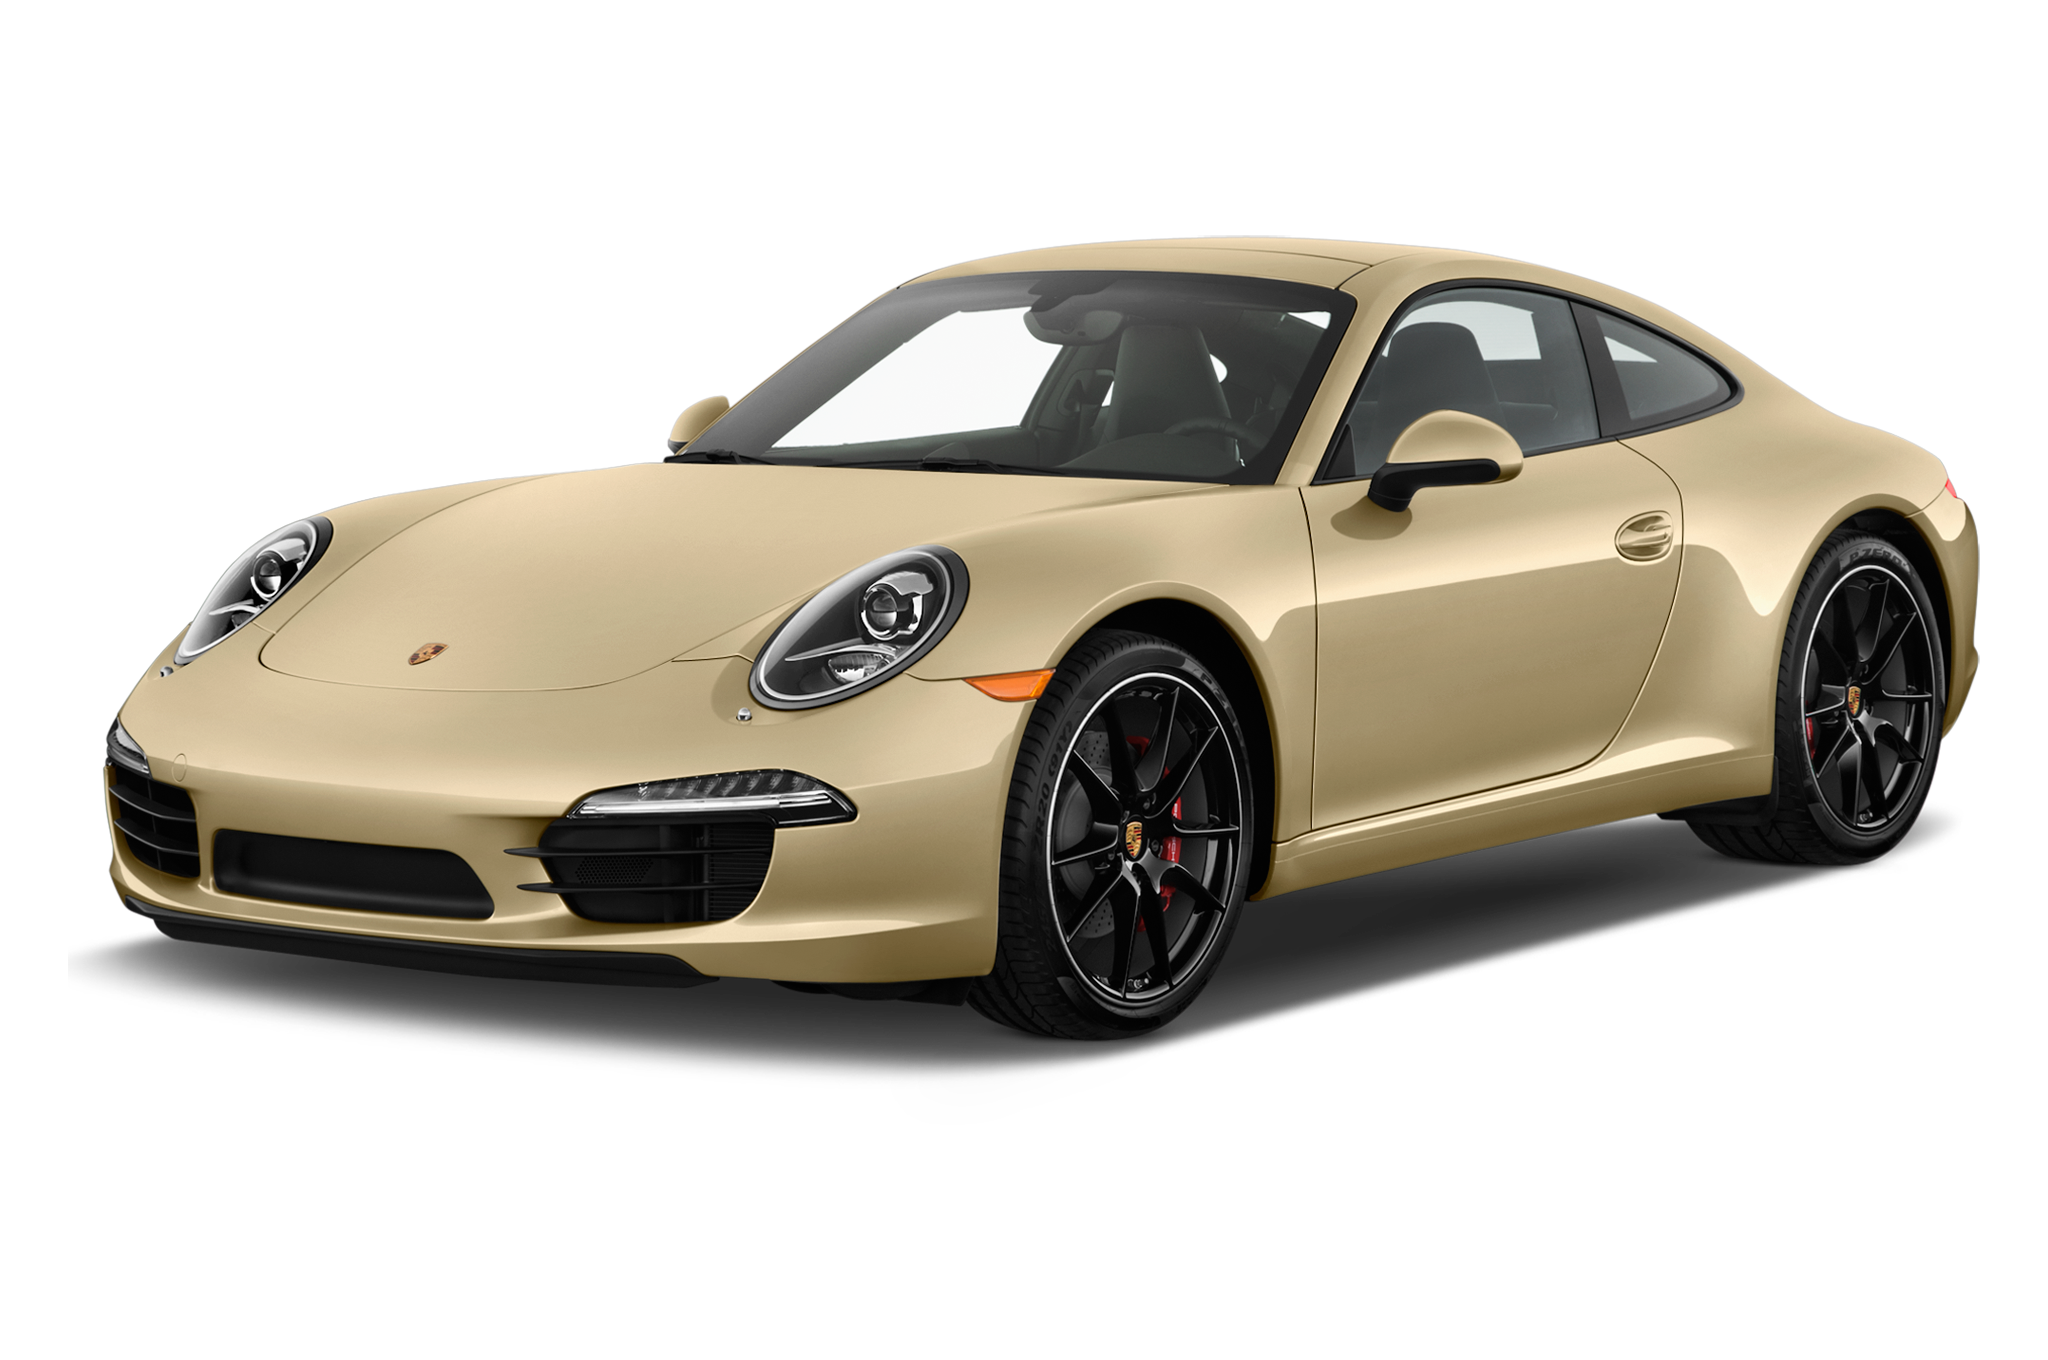 Porsche 911 Carrera Gts Coupe 2015 International Price Overview